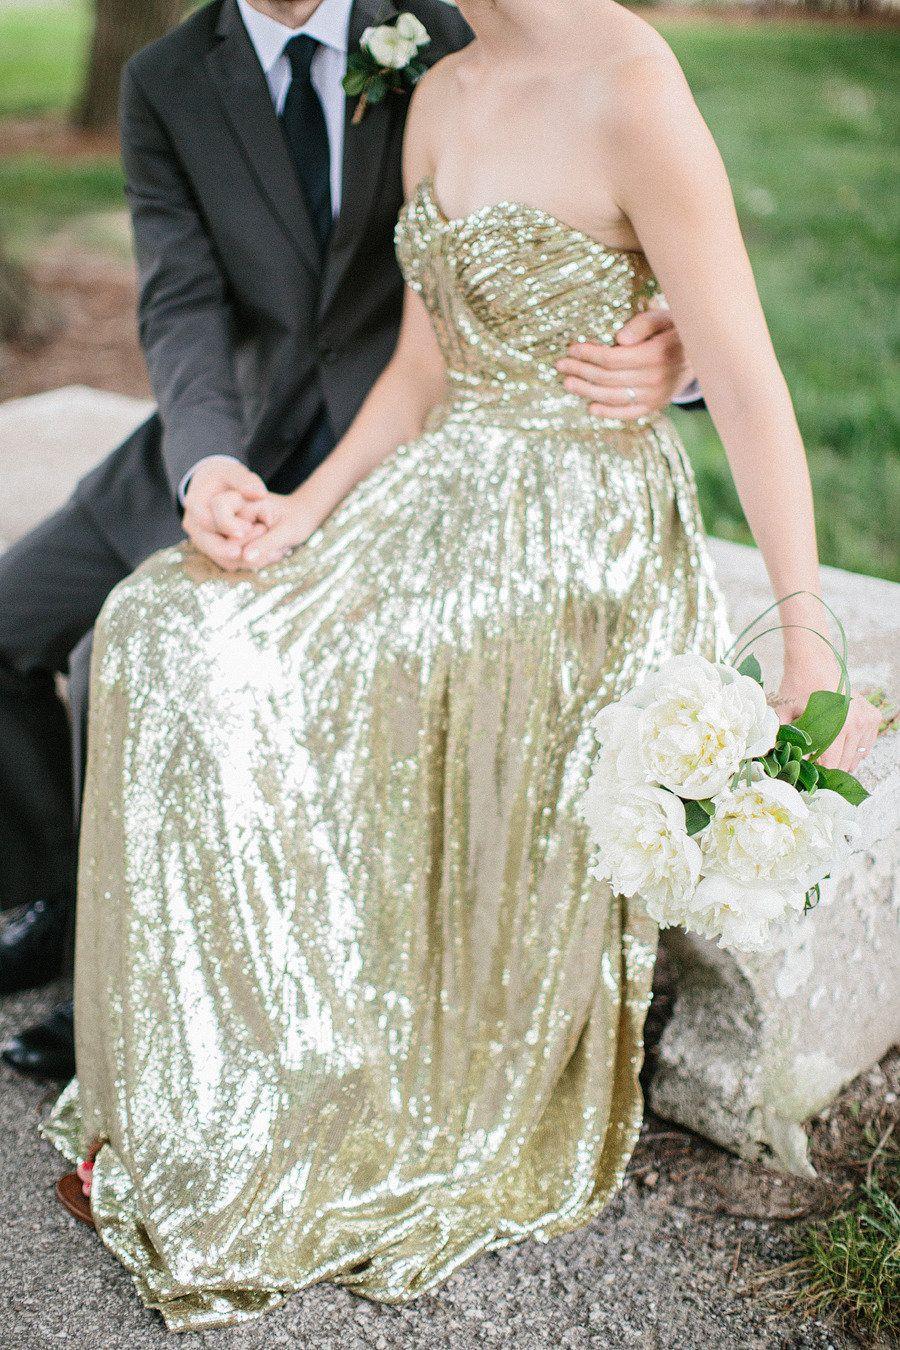 St. Louis Wedding from Megan Thiele Studios | Badgley mischka ...